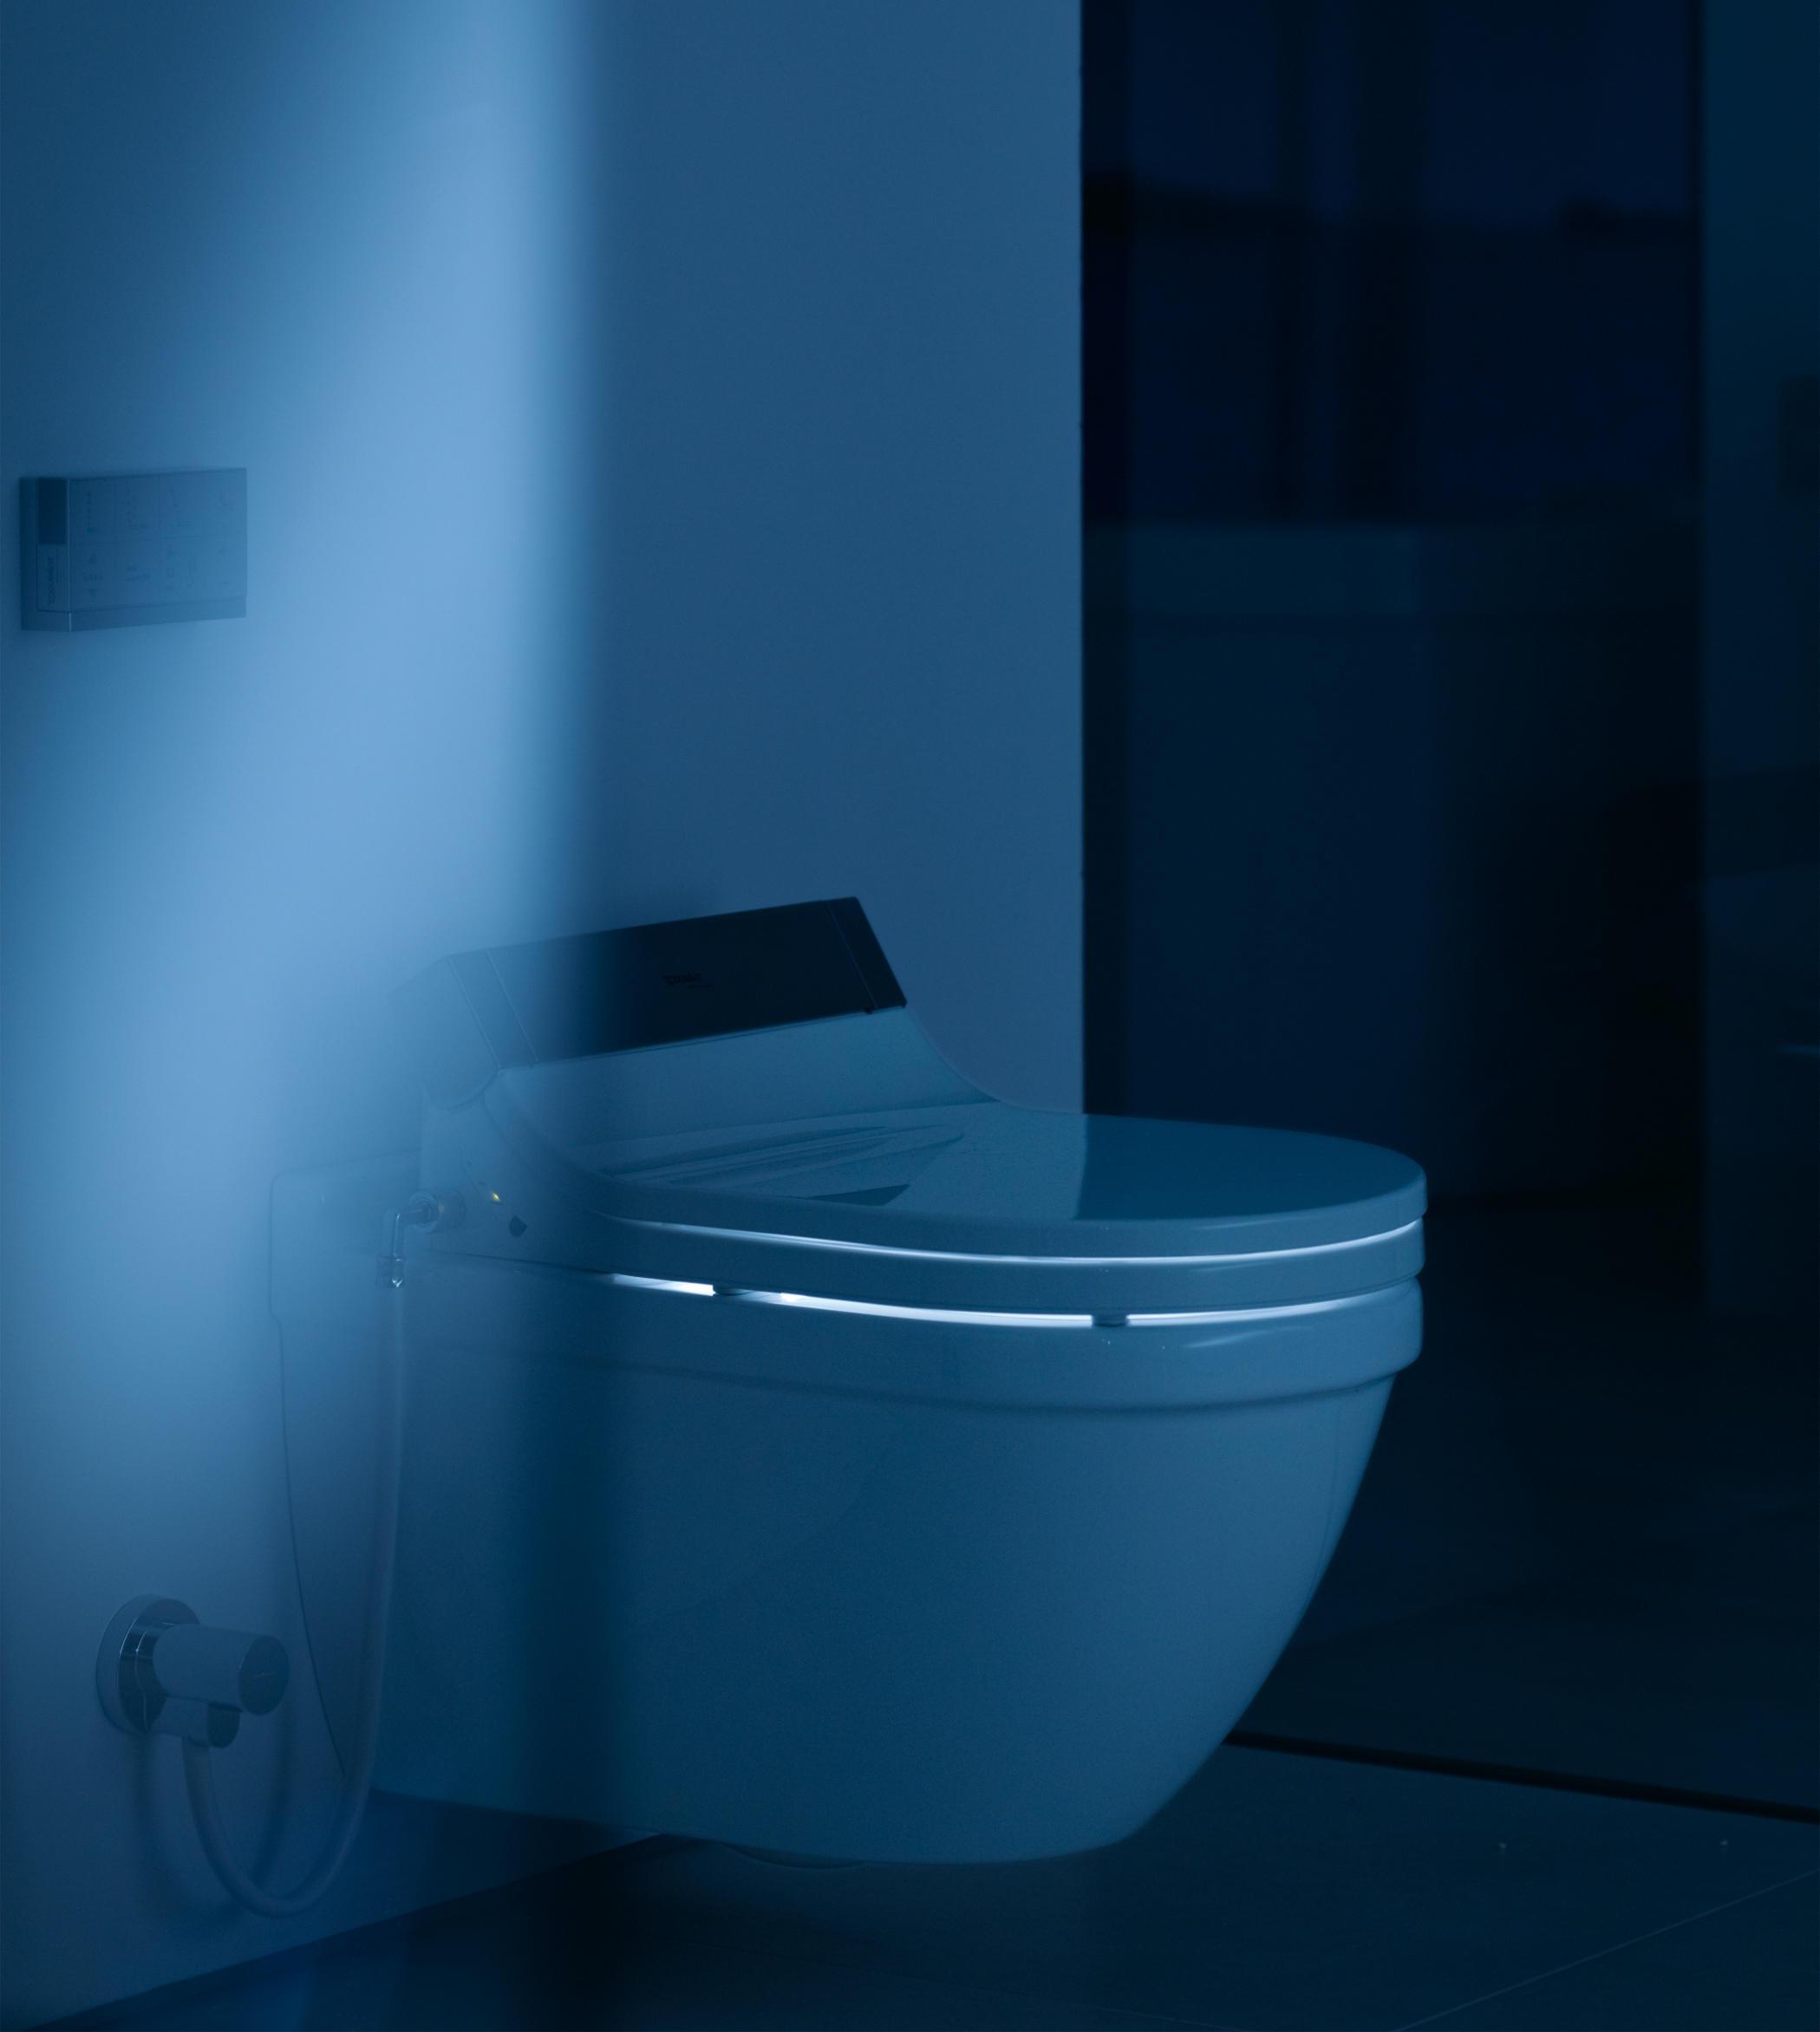 STARCK 2 - URINAL - Urinals from DURAVIT | Architonic